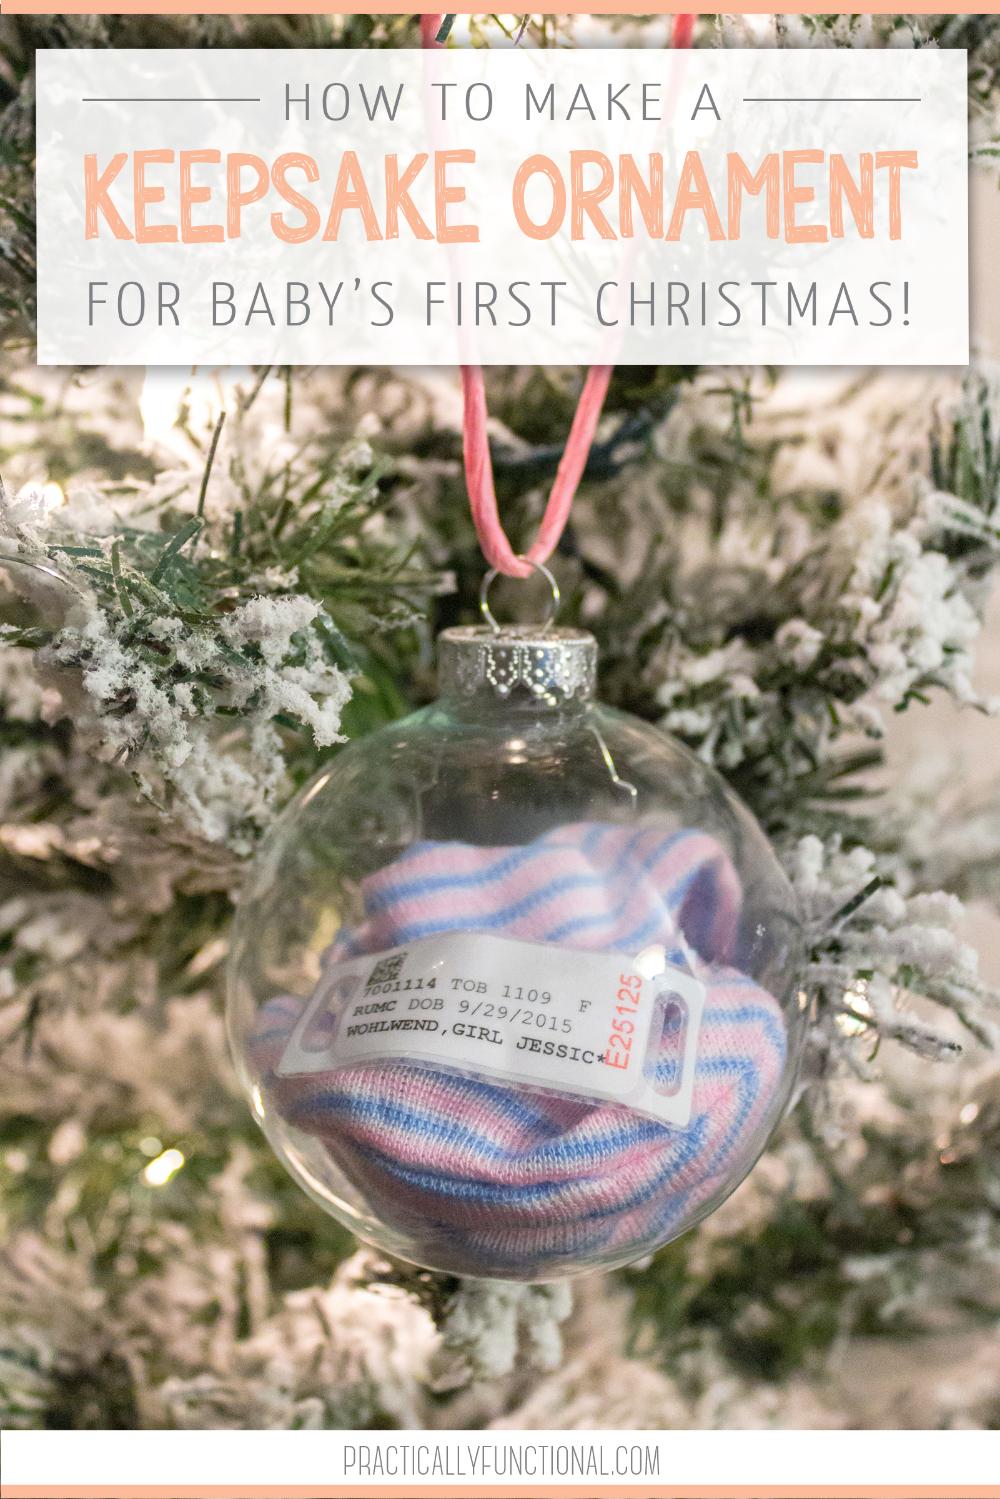 Baby's 1st Christmas Keepsake Ornament